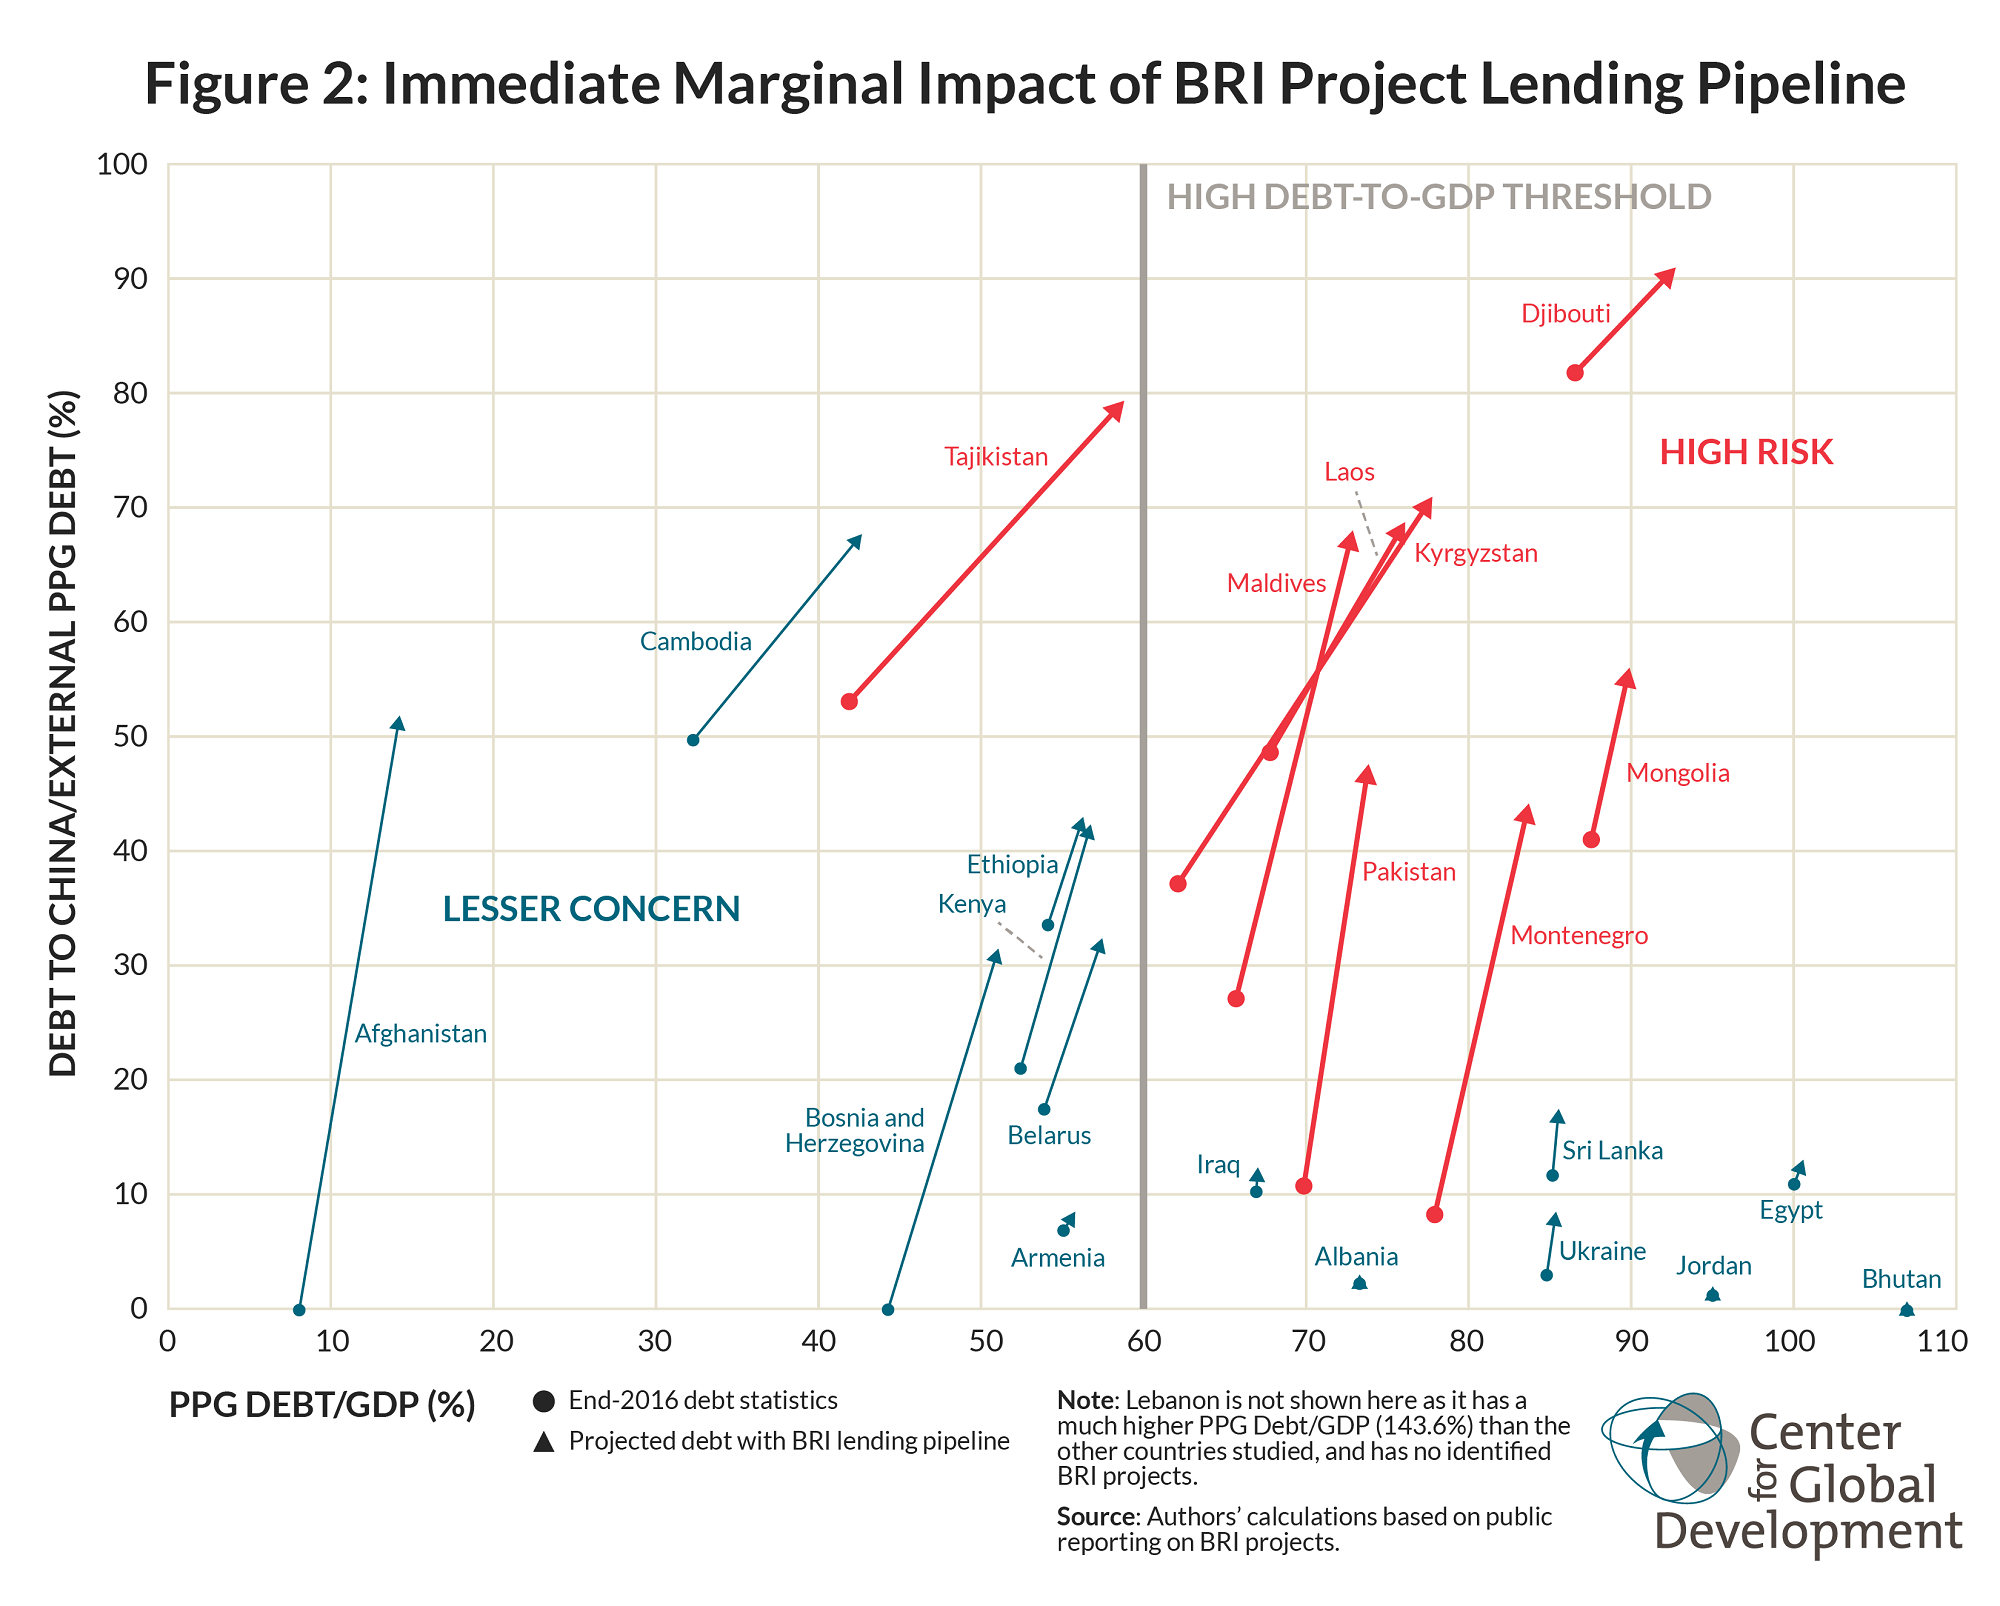 Figure 2: Immediate Marginal Impact of BRI Project Lending Pipeline